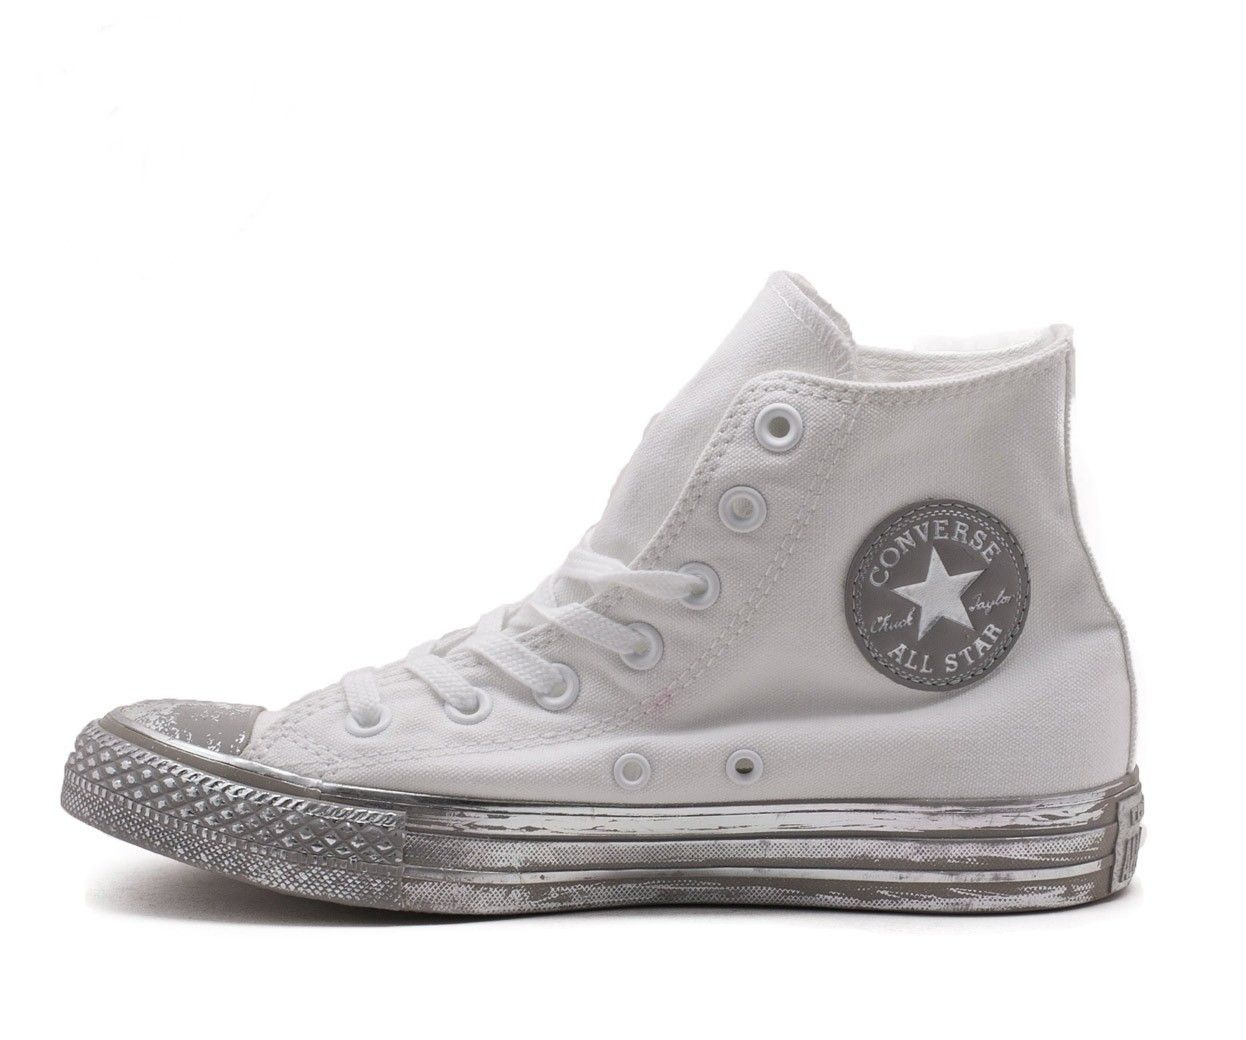 Sneaker Converse All Star 156769c ctas hi white silver black summer 2017